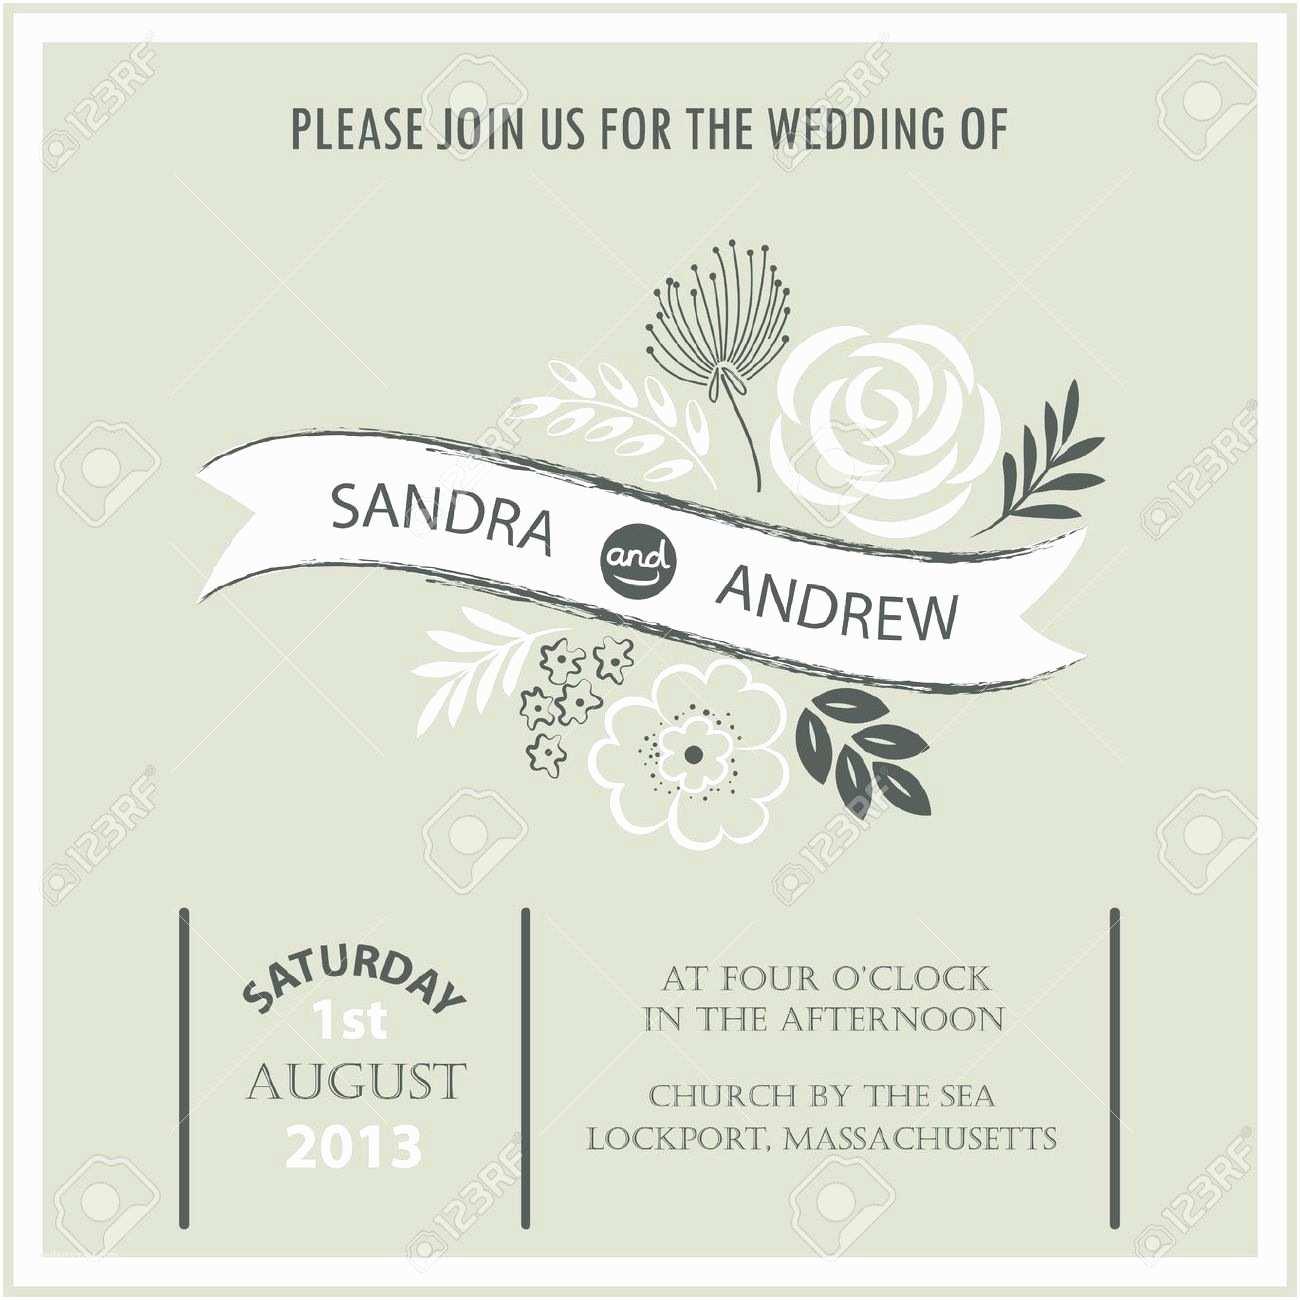 Wedding Invitation Card Maker Free Best Wedding Invitations Cards Wedding Invitation Card